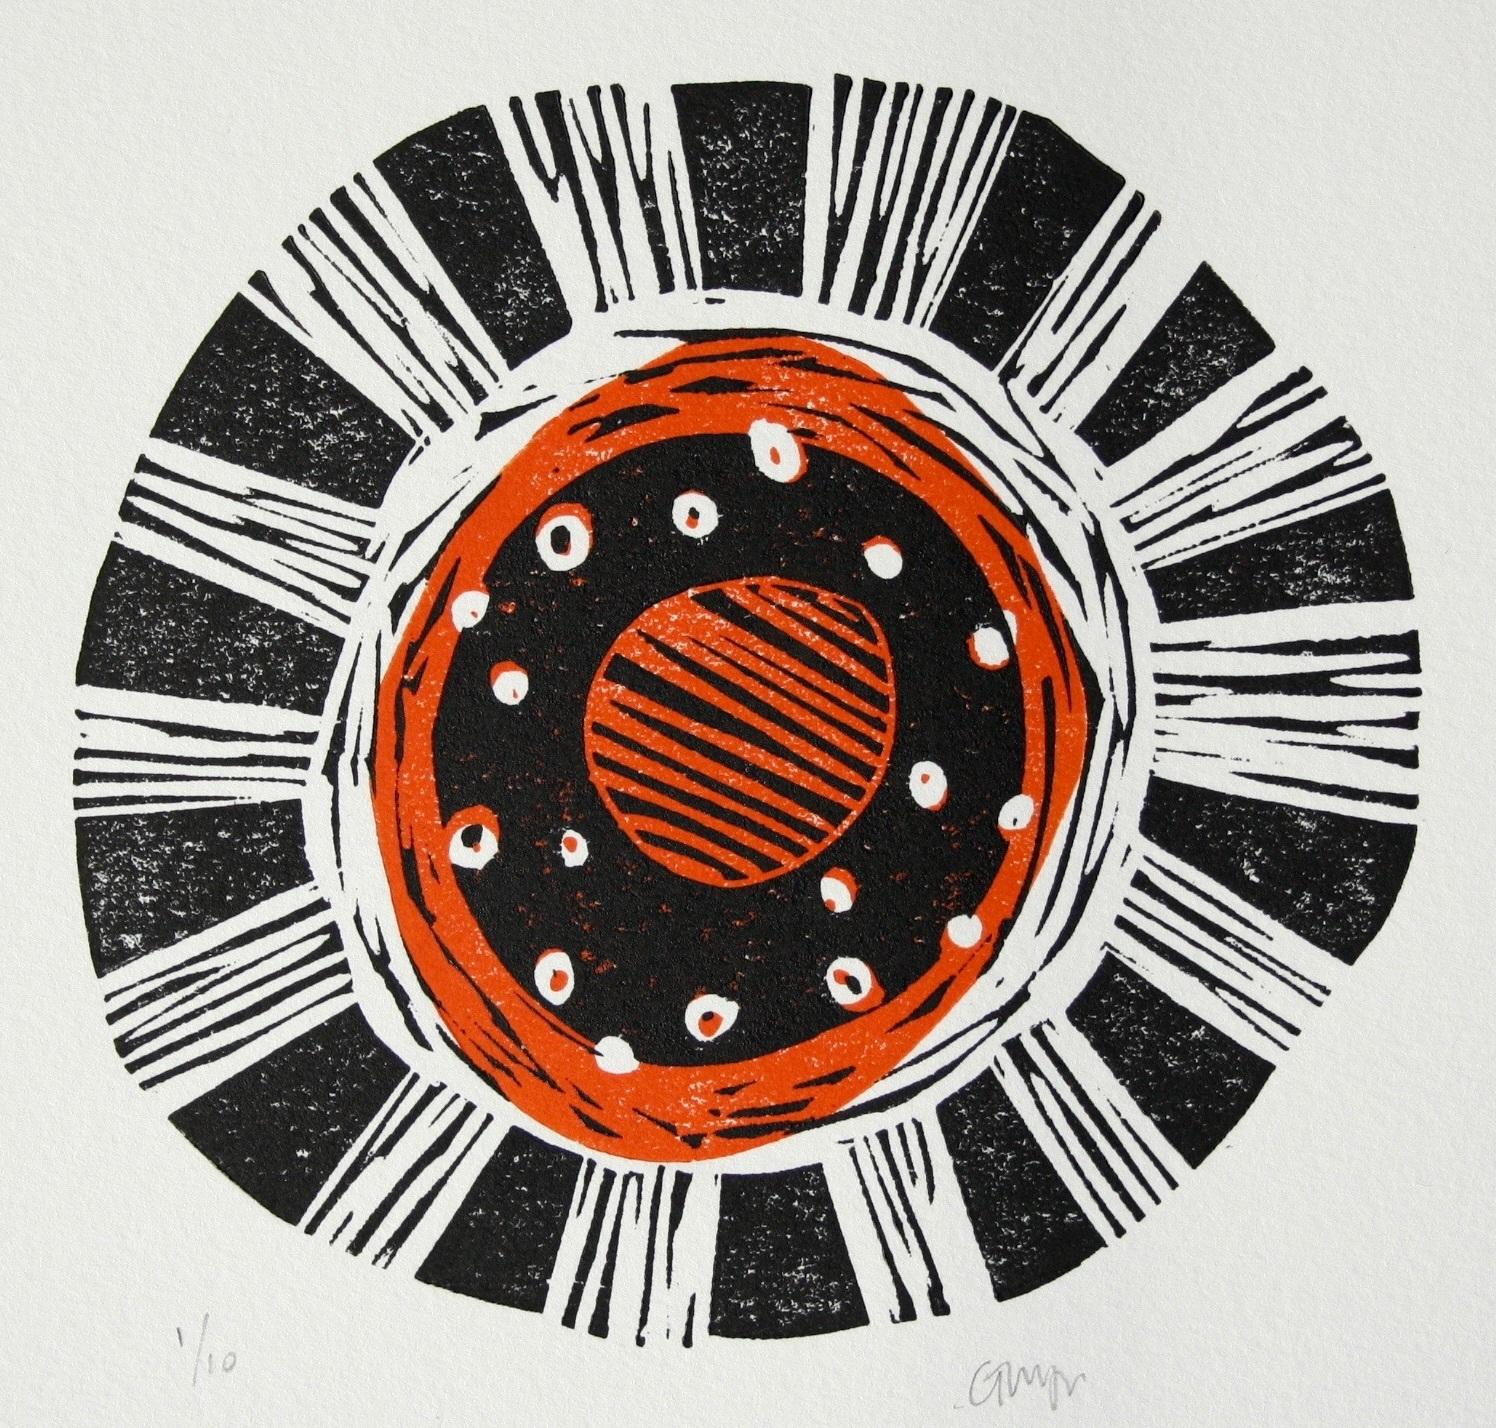 Prints & Illustrations - Hand printed linocuts